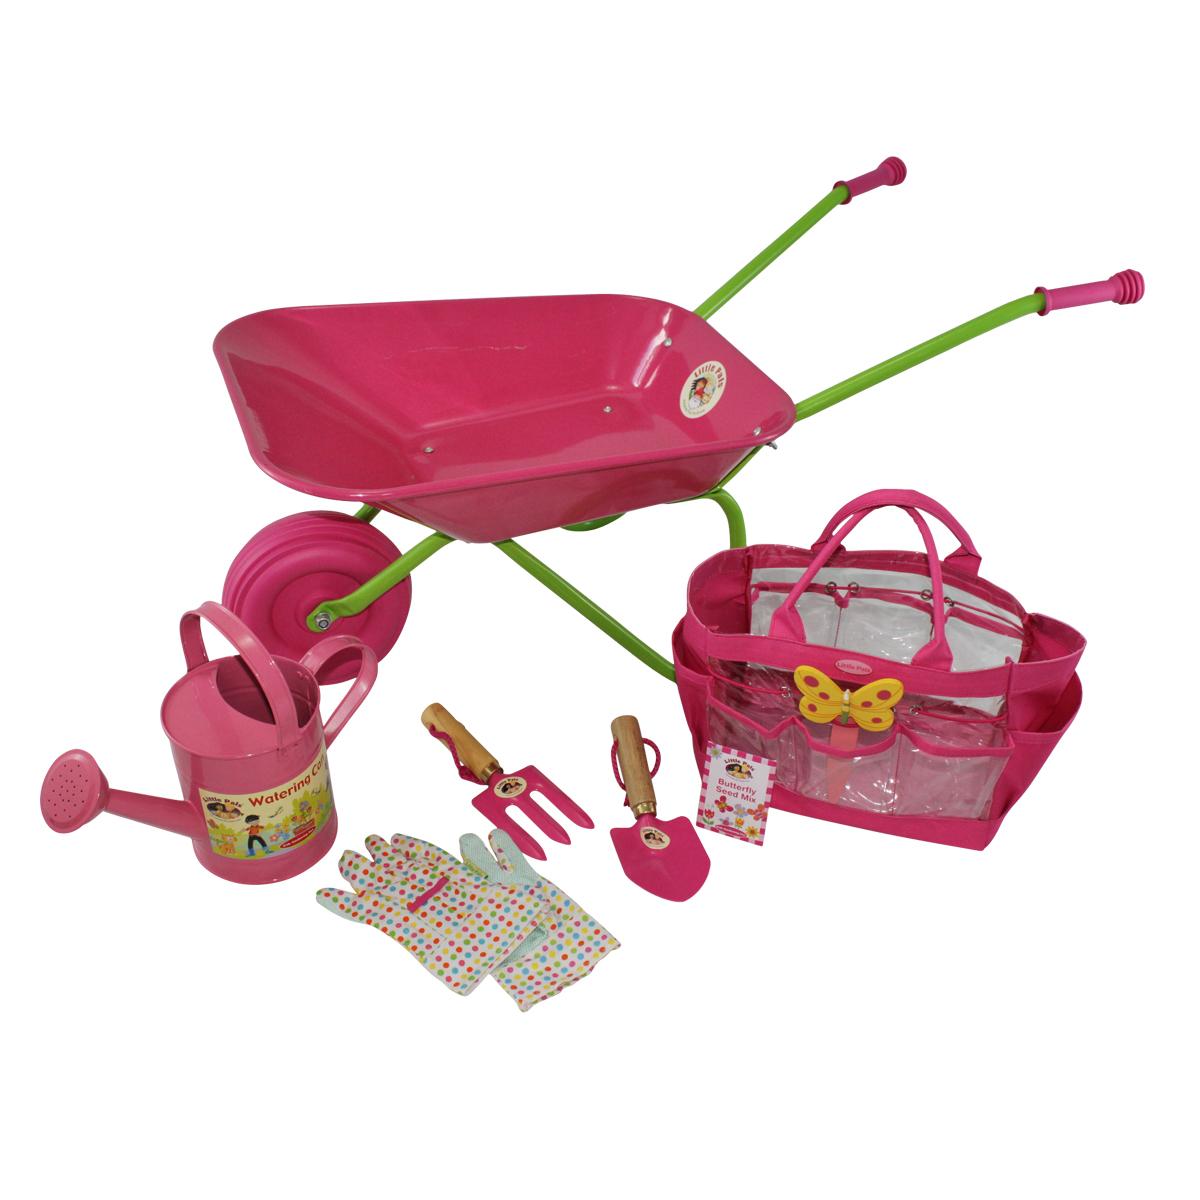 Childrens Wheelbarrow Pink and Tool Kit Bag